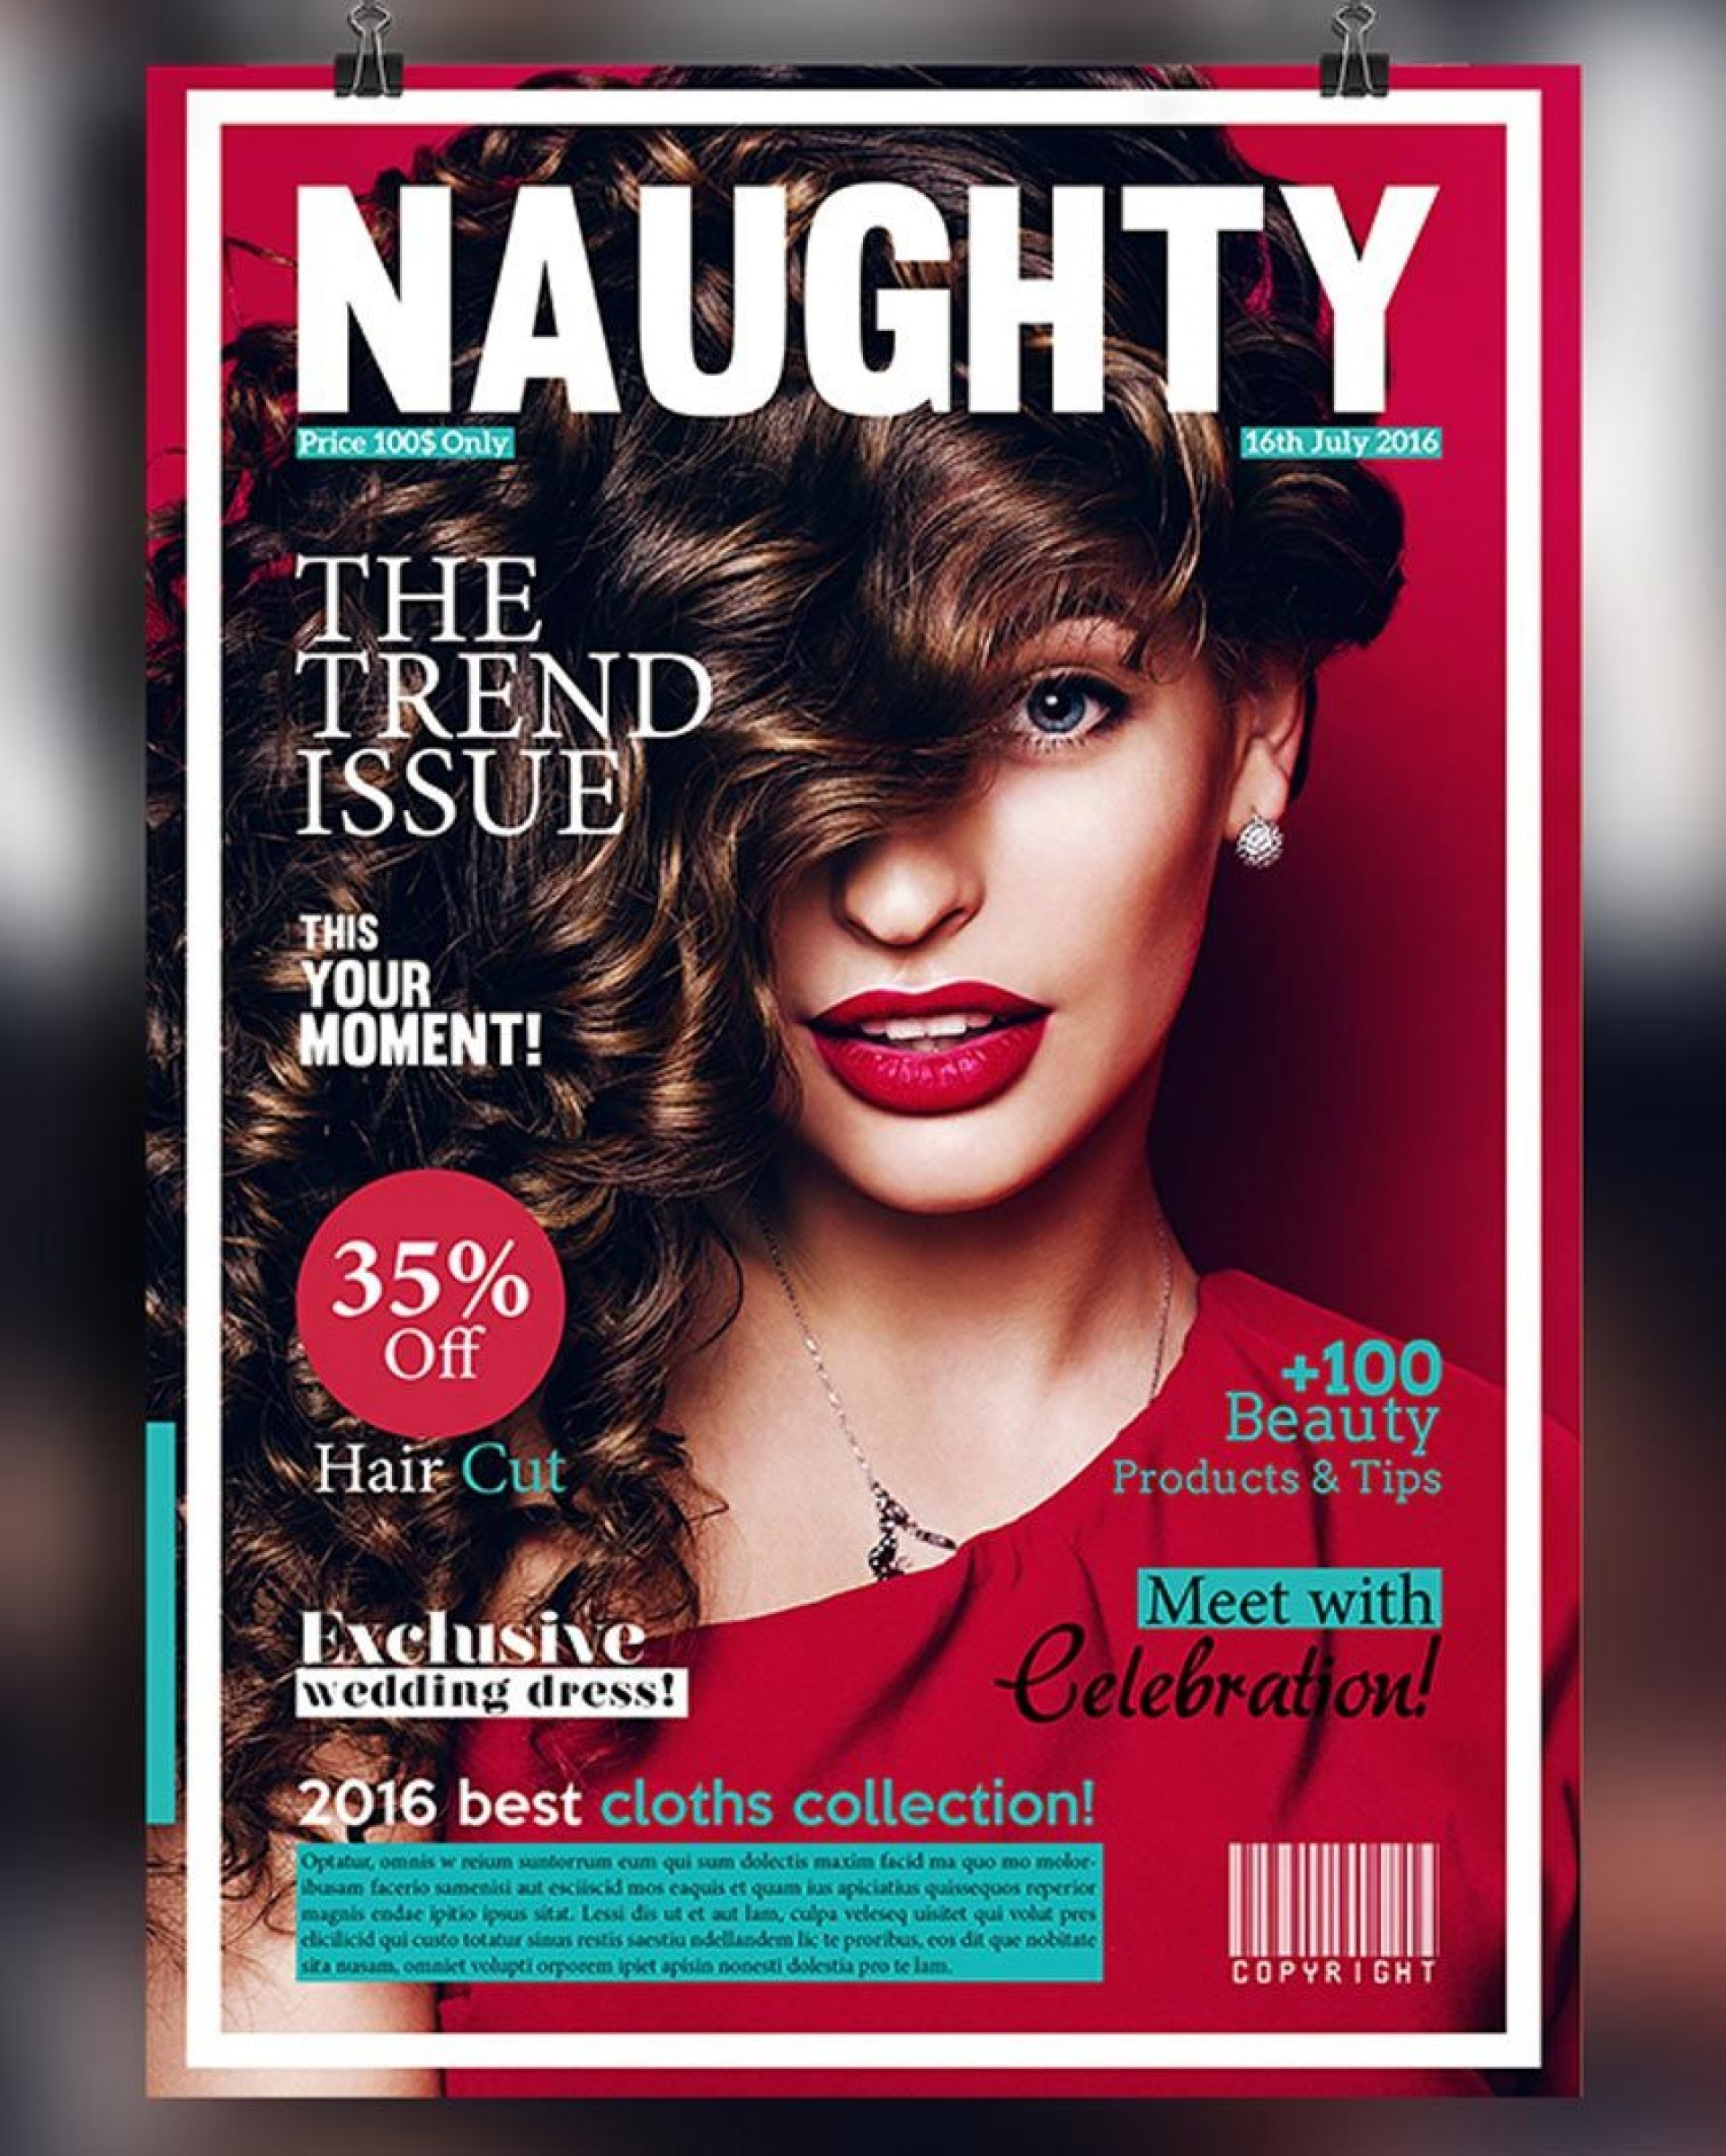 006 Marvelou Photoshop Fashion Magazine Cover Template Free Idea 1920